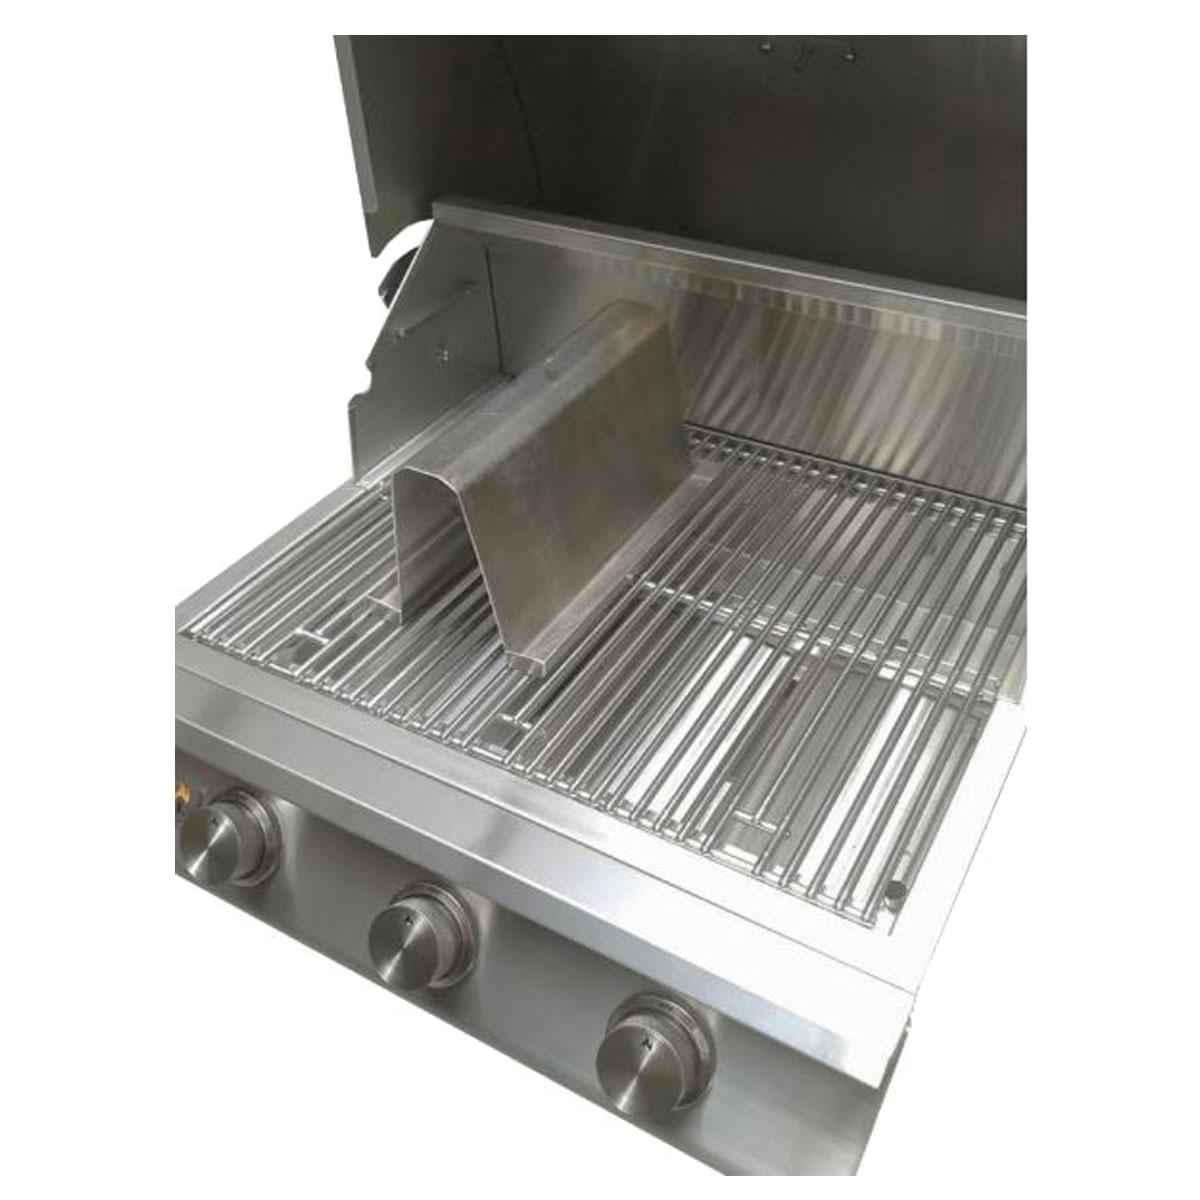 Chapa Bacon Grilling Crispy Inox 304  - Sua Casa Gourmet e Cia